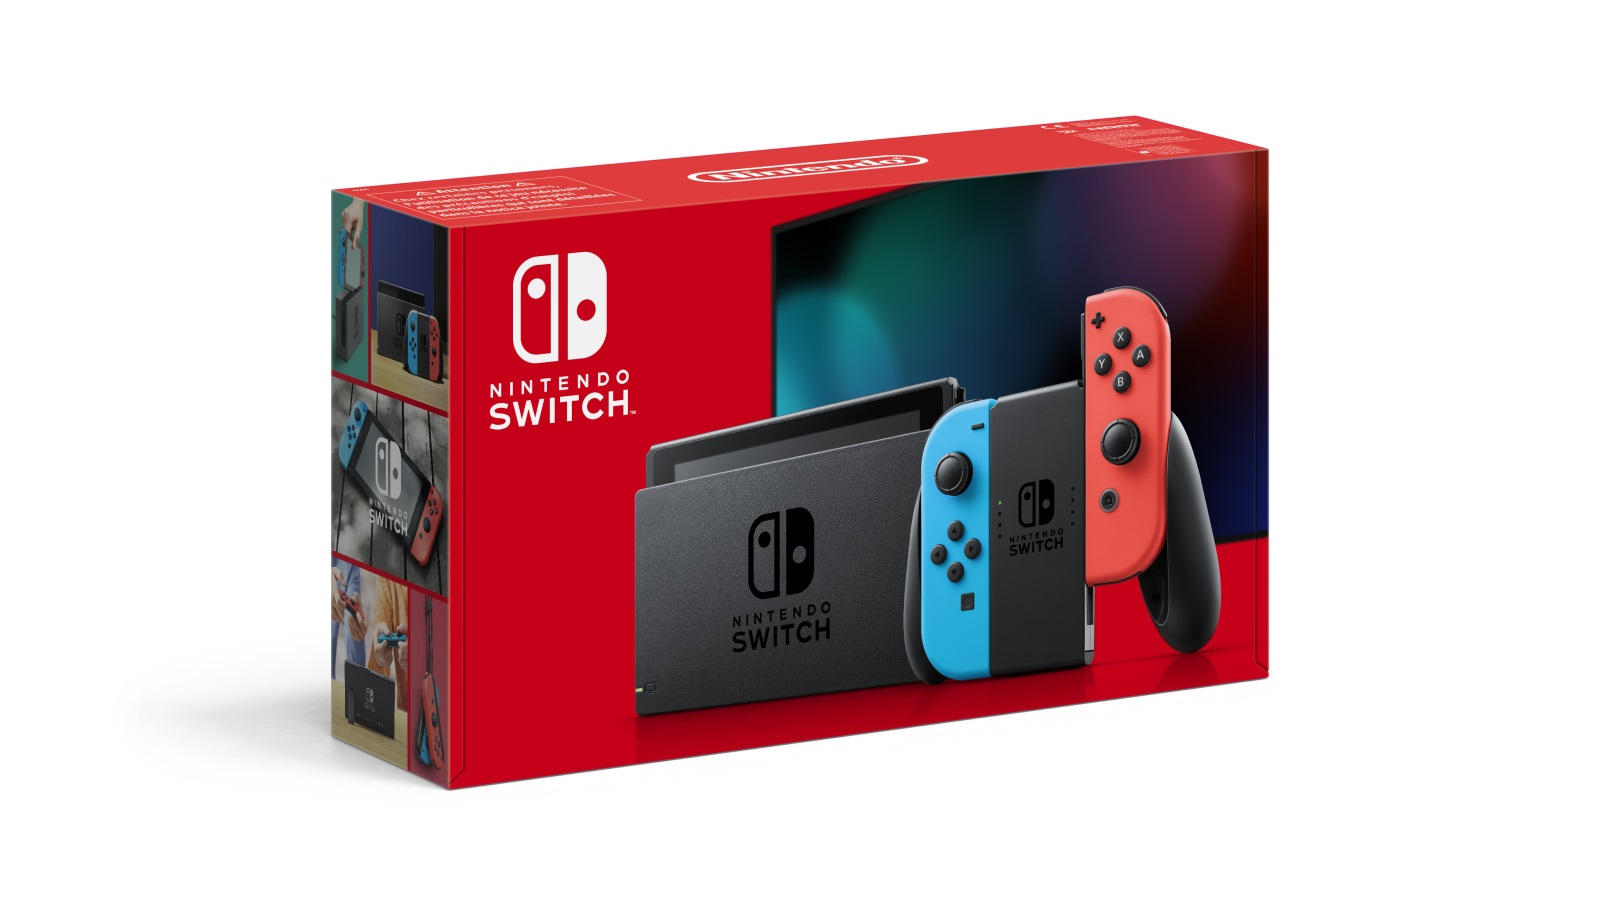 Nintendo Switch עם ג'וי-קון כחול ואדום